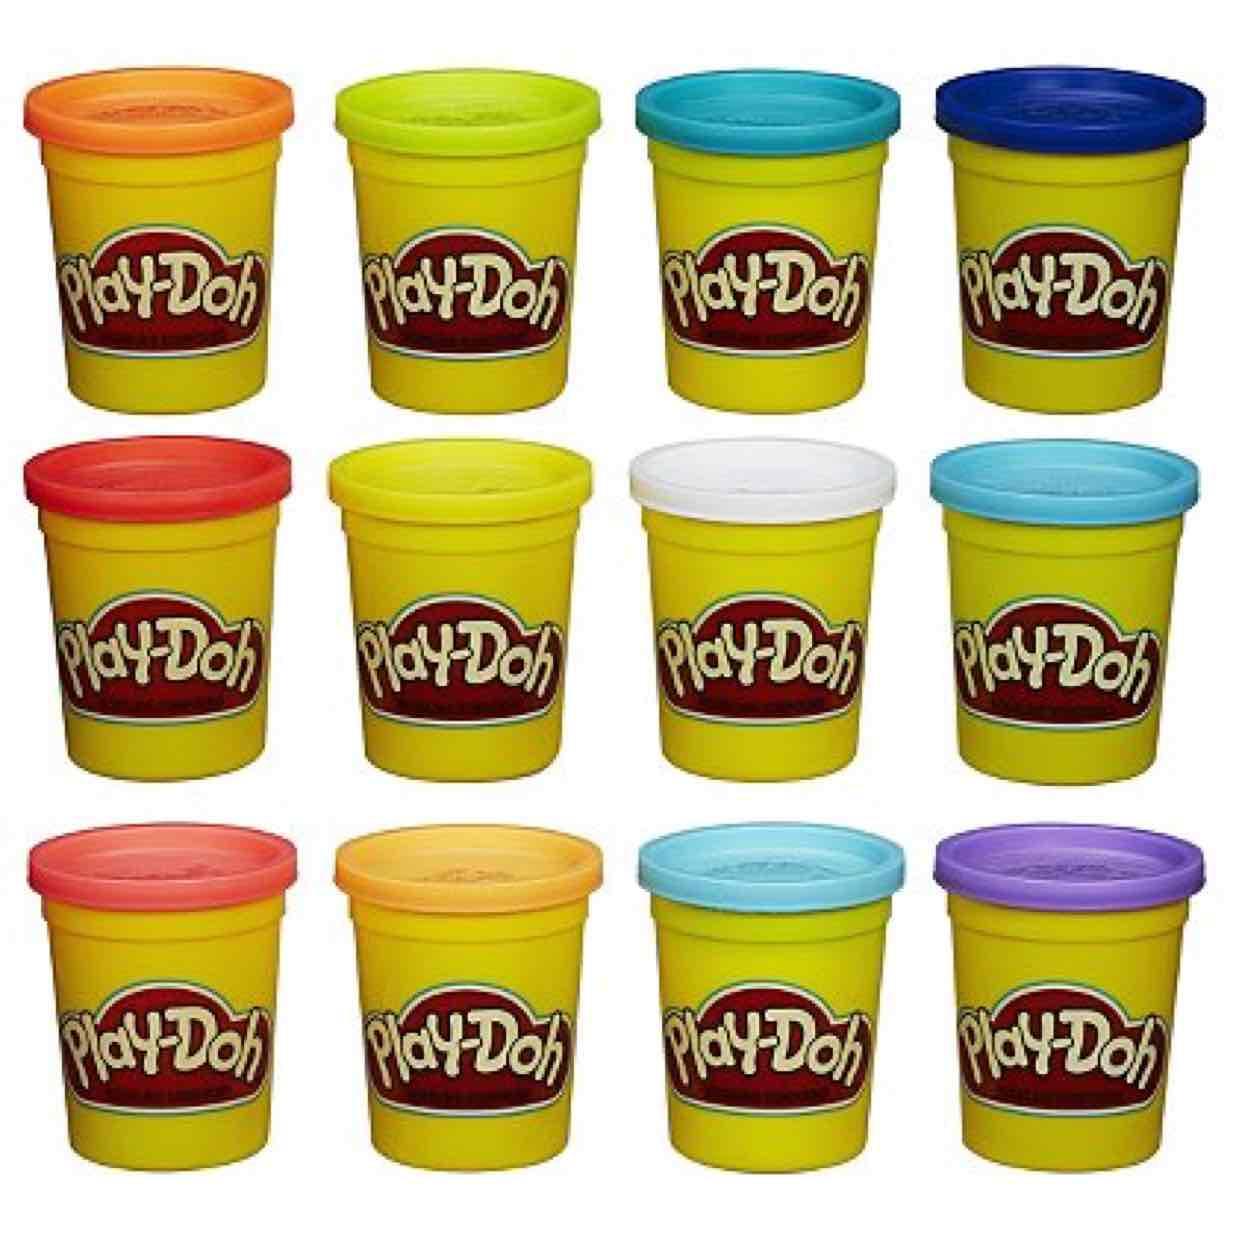 Play-Doh 12 pack - £5 instore at ASDA!